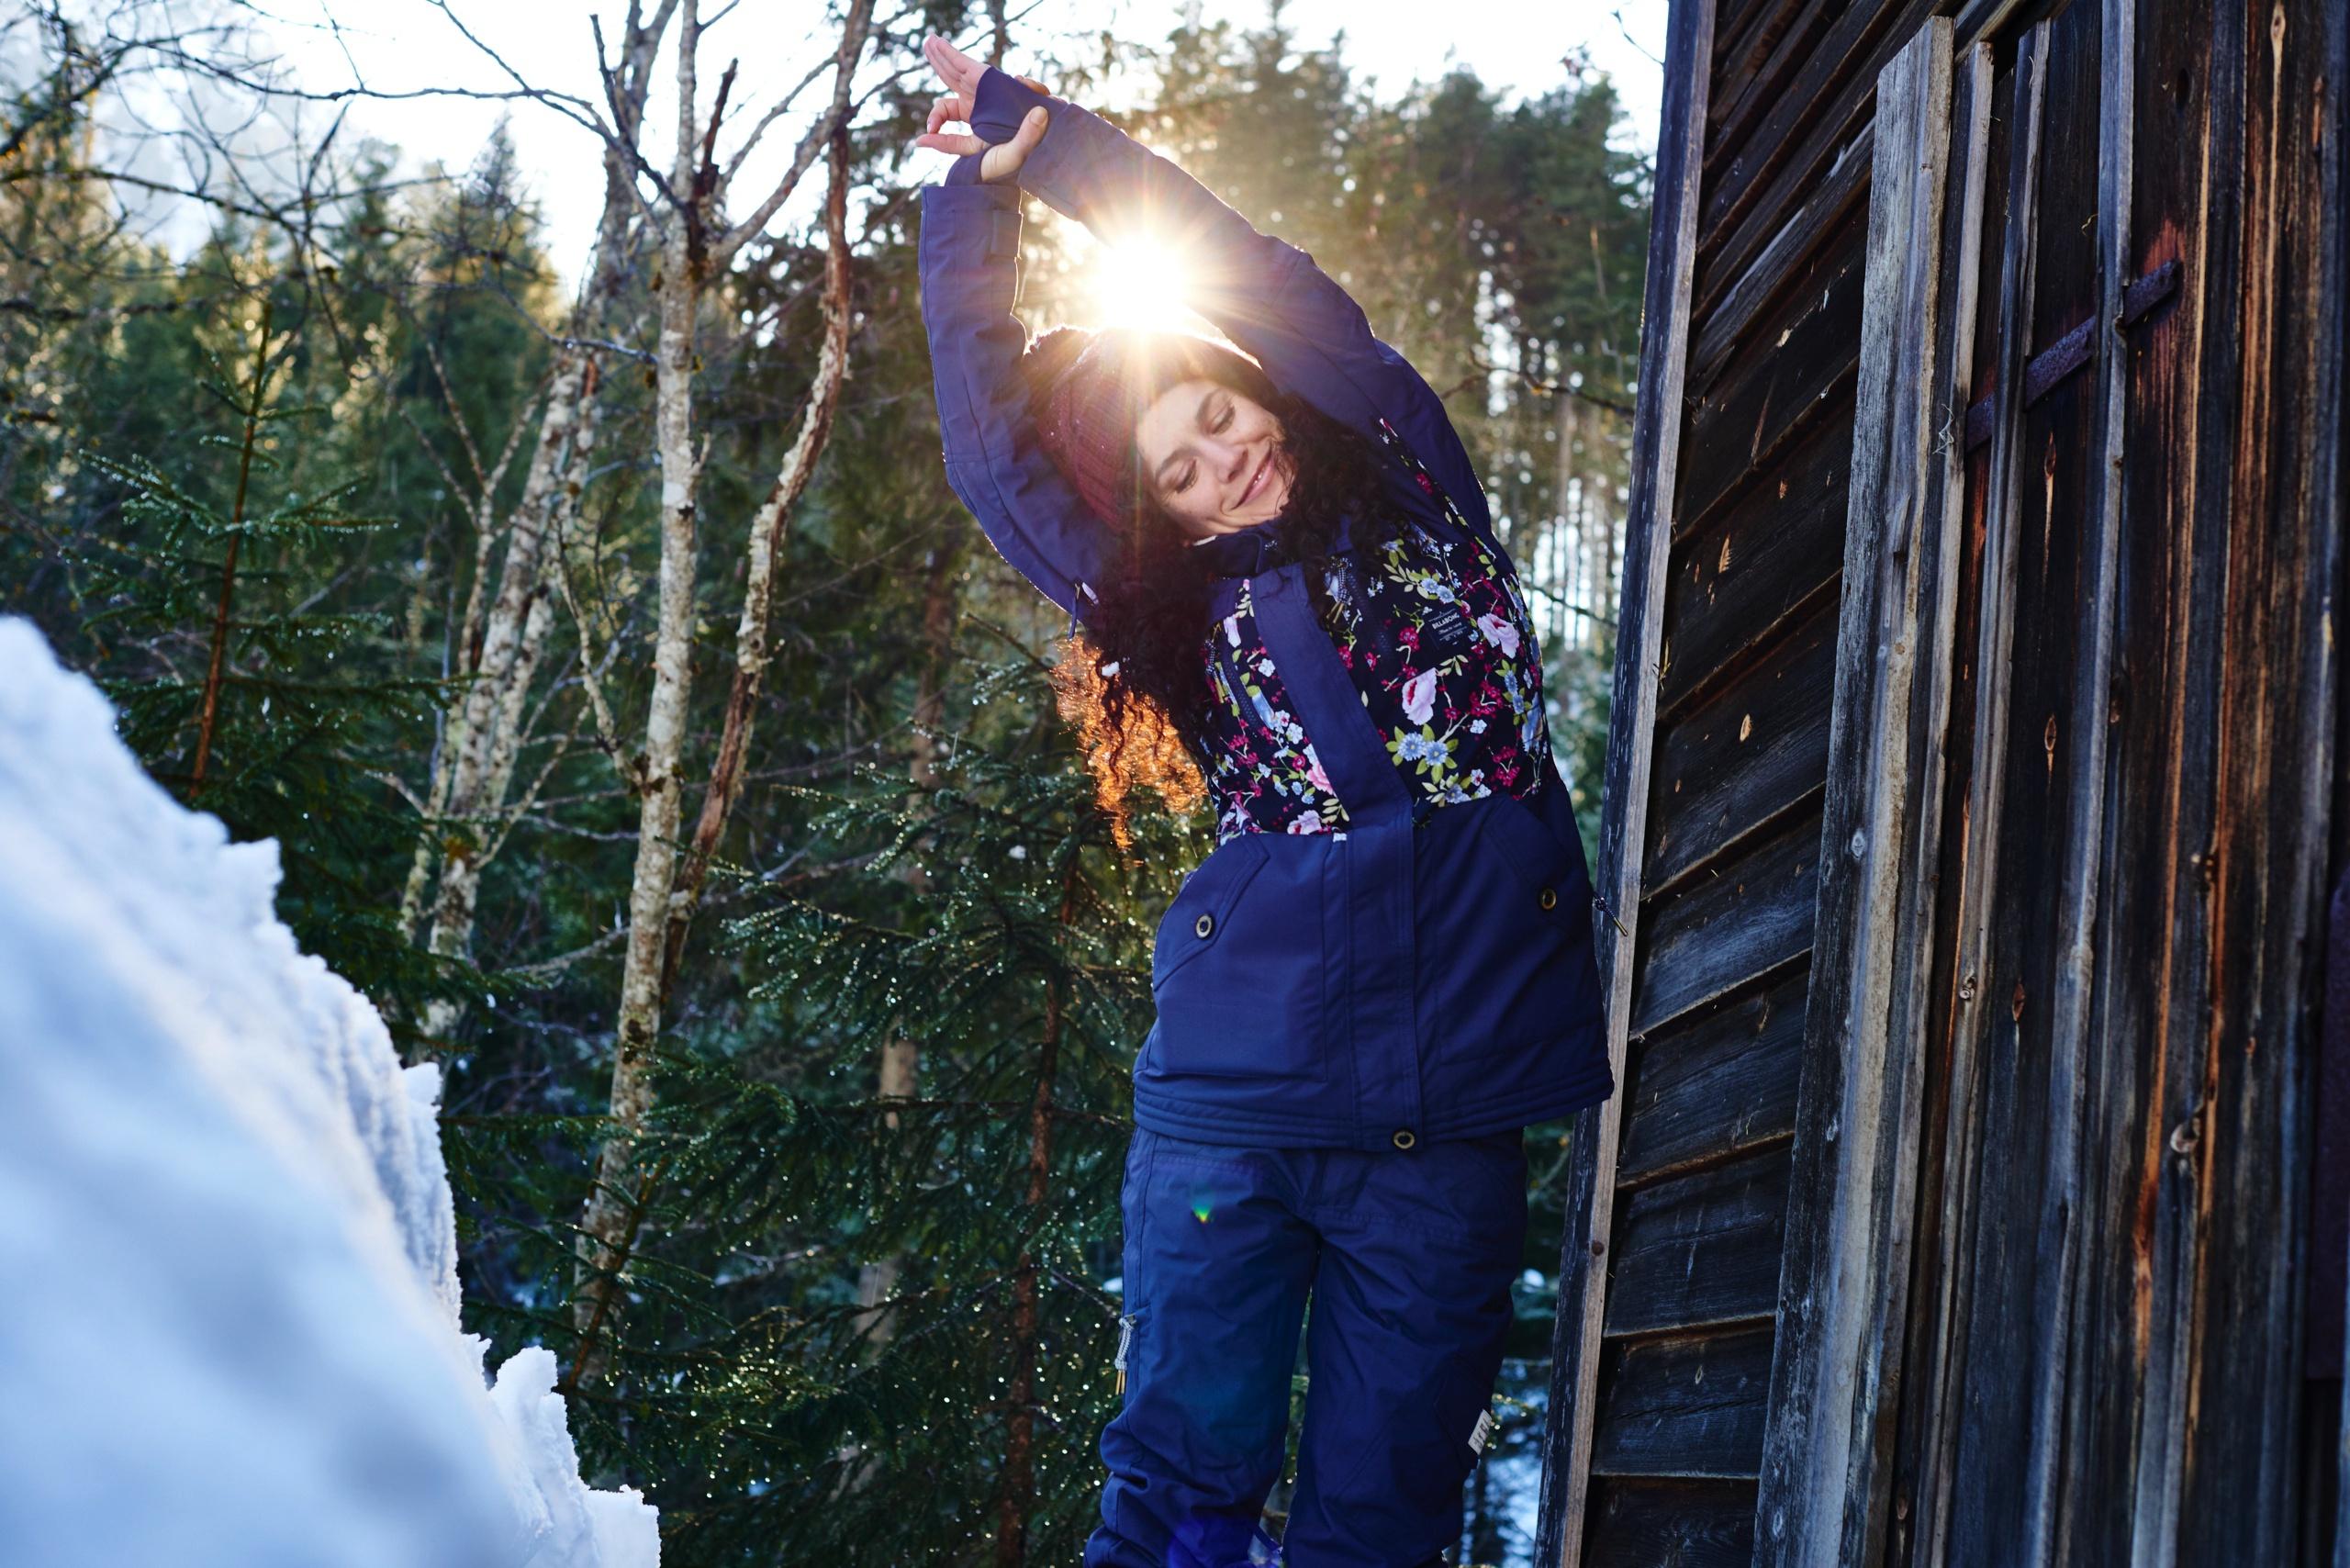 Anna-Kathalina-Langer-Snowga-Snoga-Yoga-Warm-Up